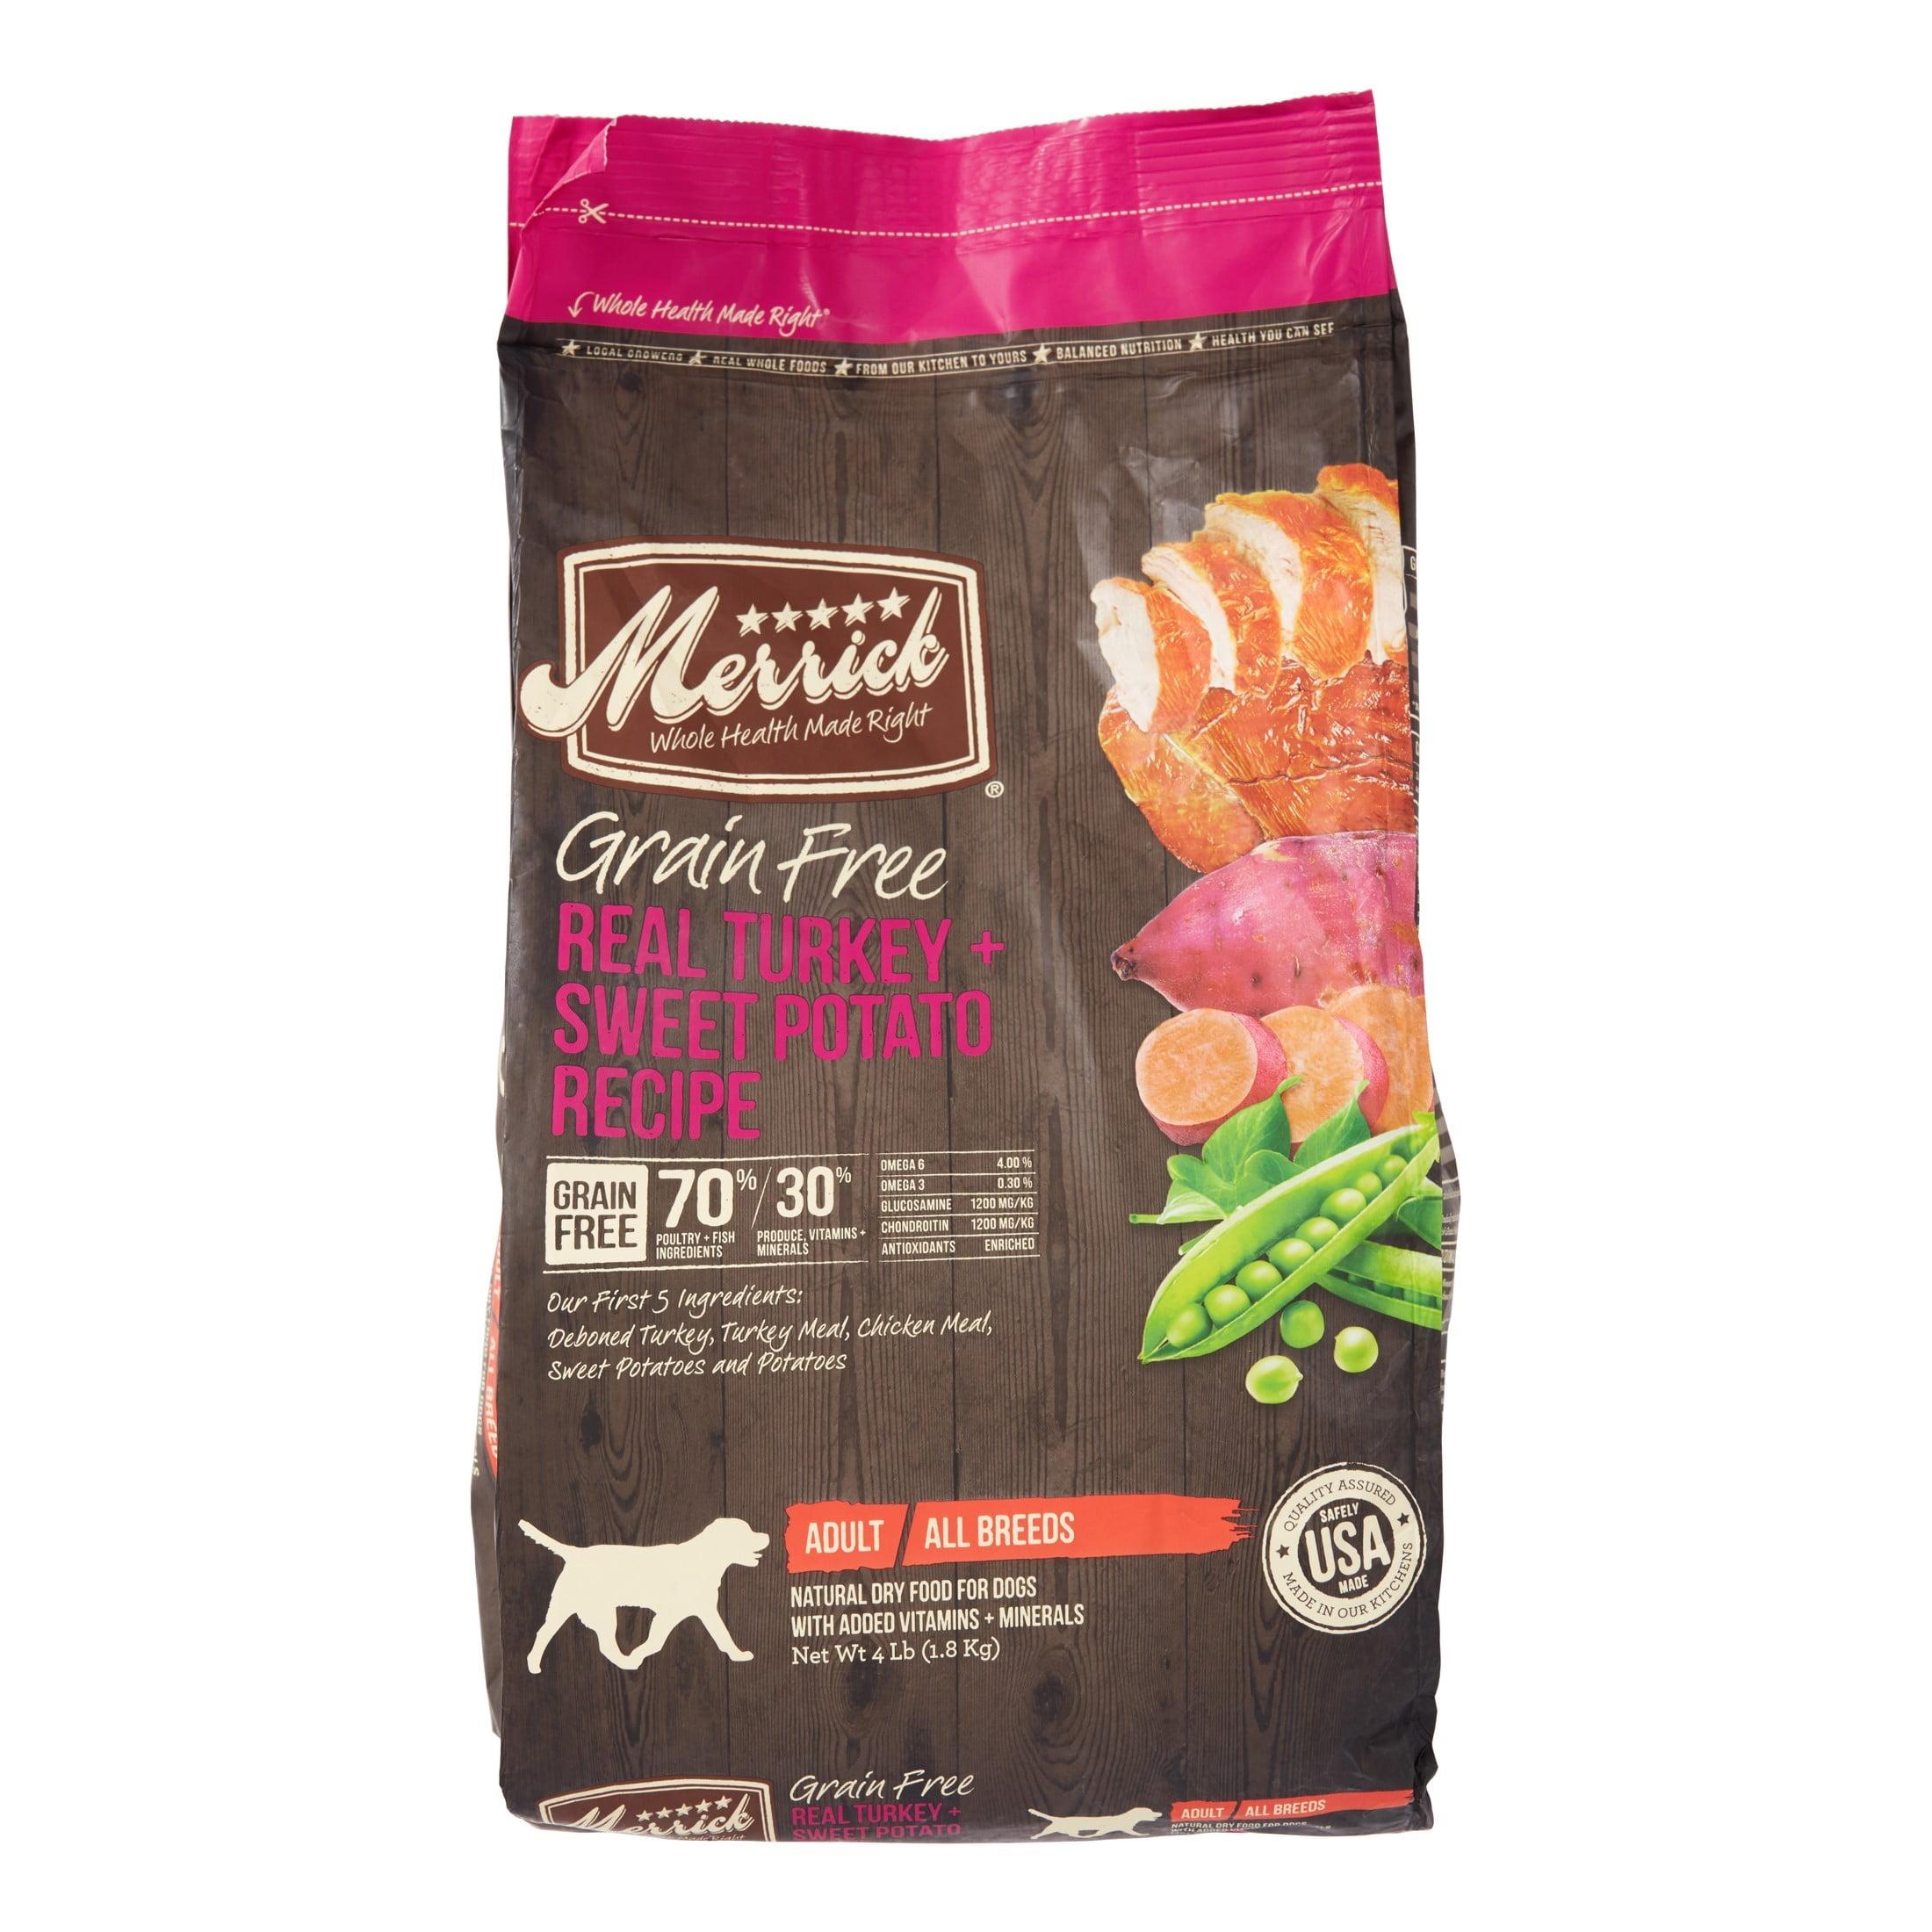 Merrick Grain-Free Real Turkey + Sweet Potato Recipe Dry Dog Food, 4 lb